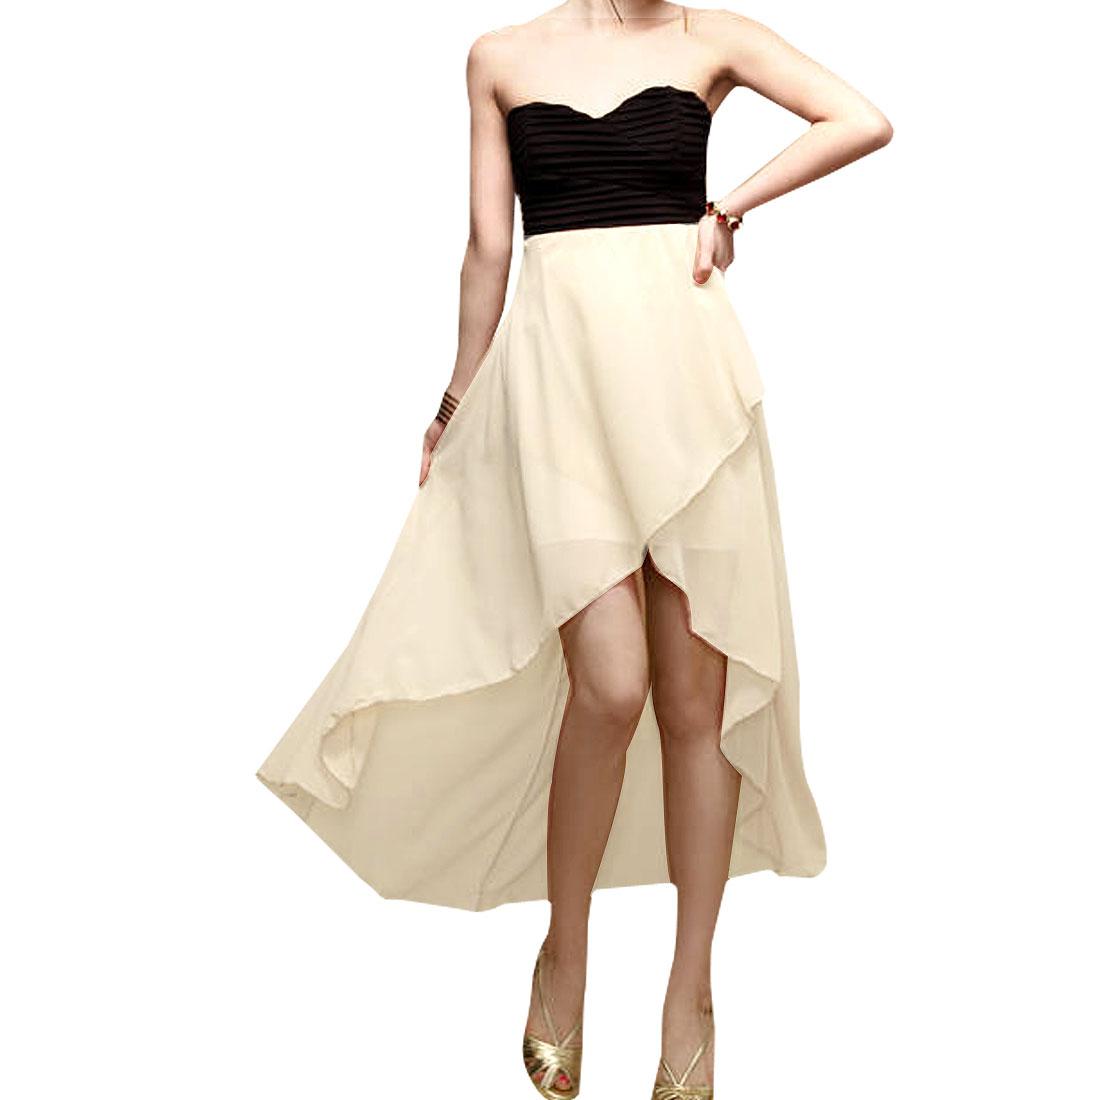 Ladies Sleeveless Black Back Hollow Out Cross Beige Chiffon Tube Dress XS